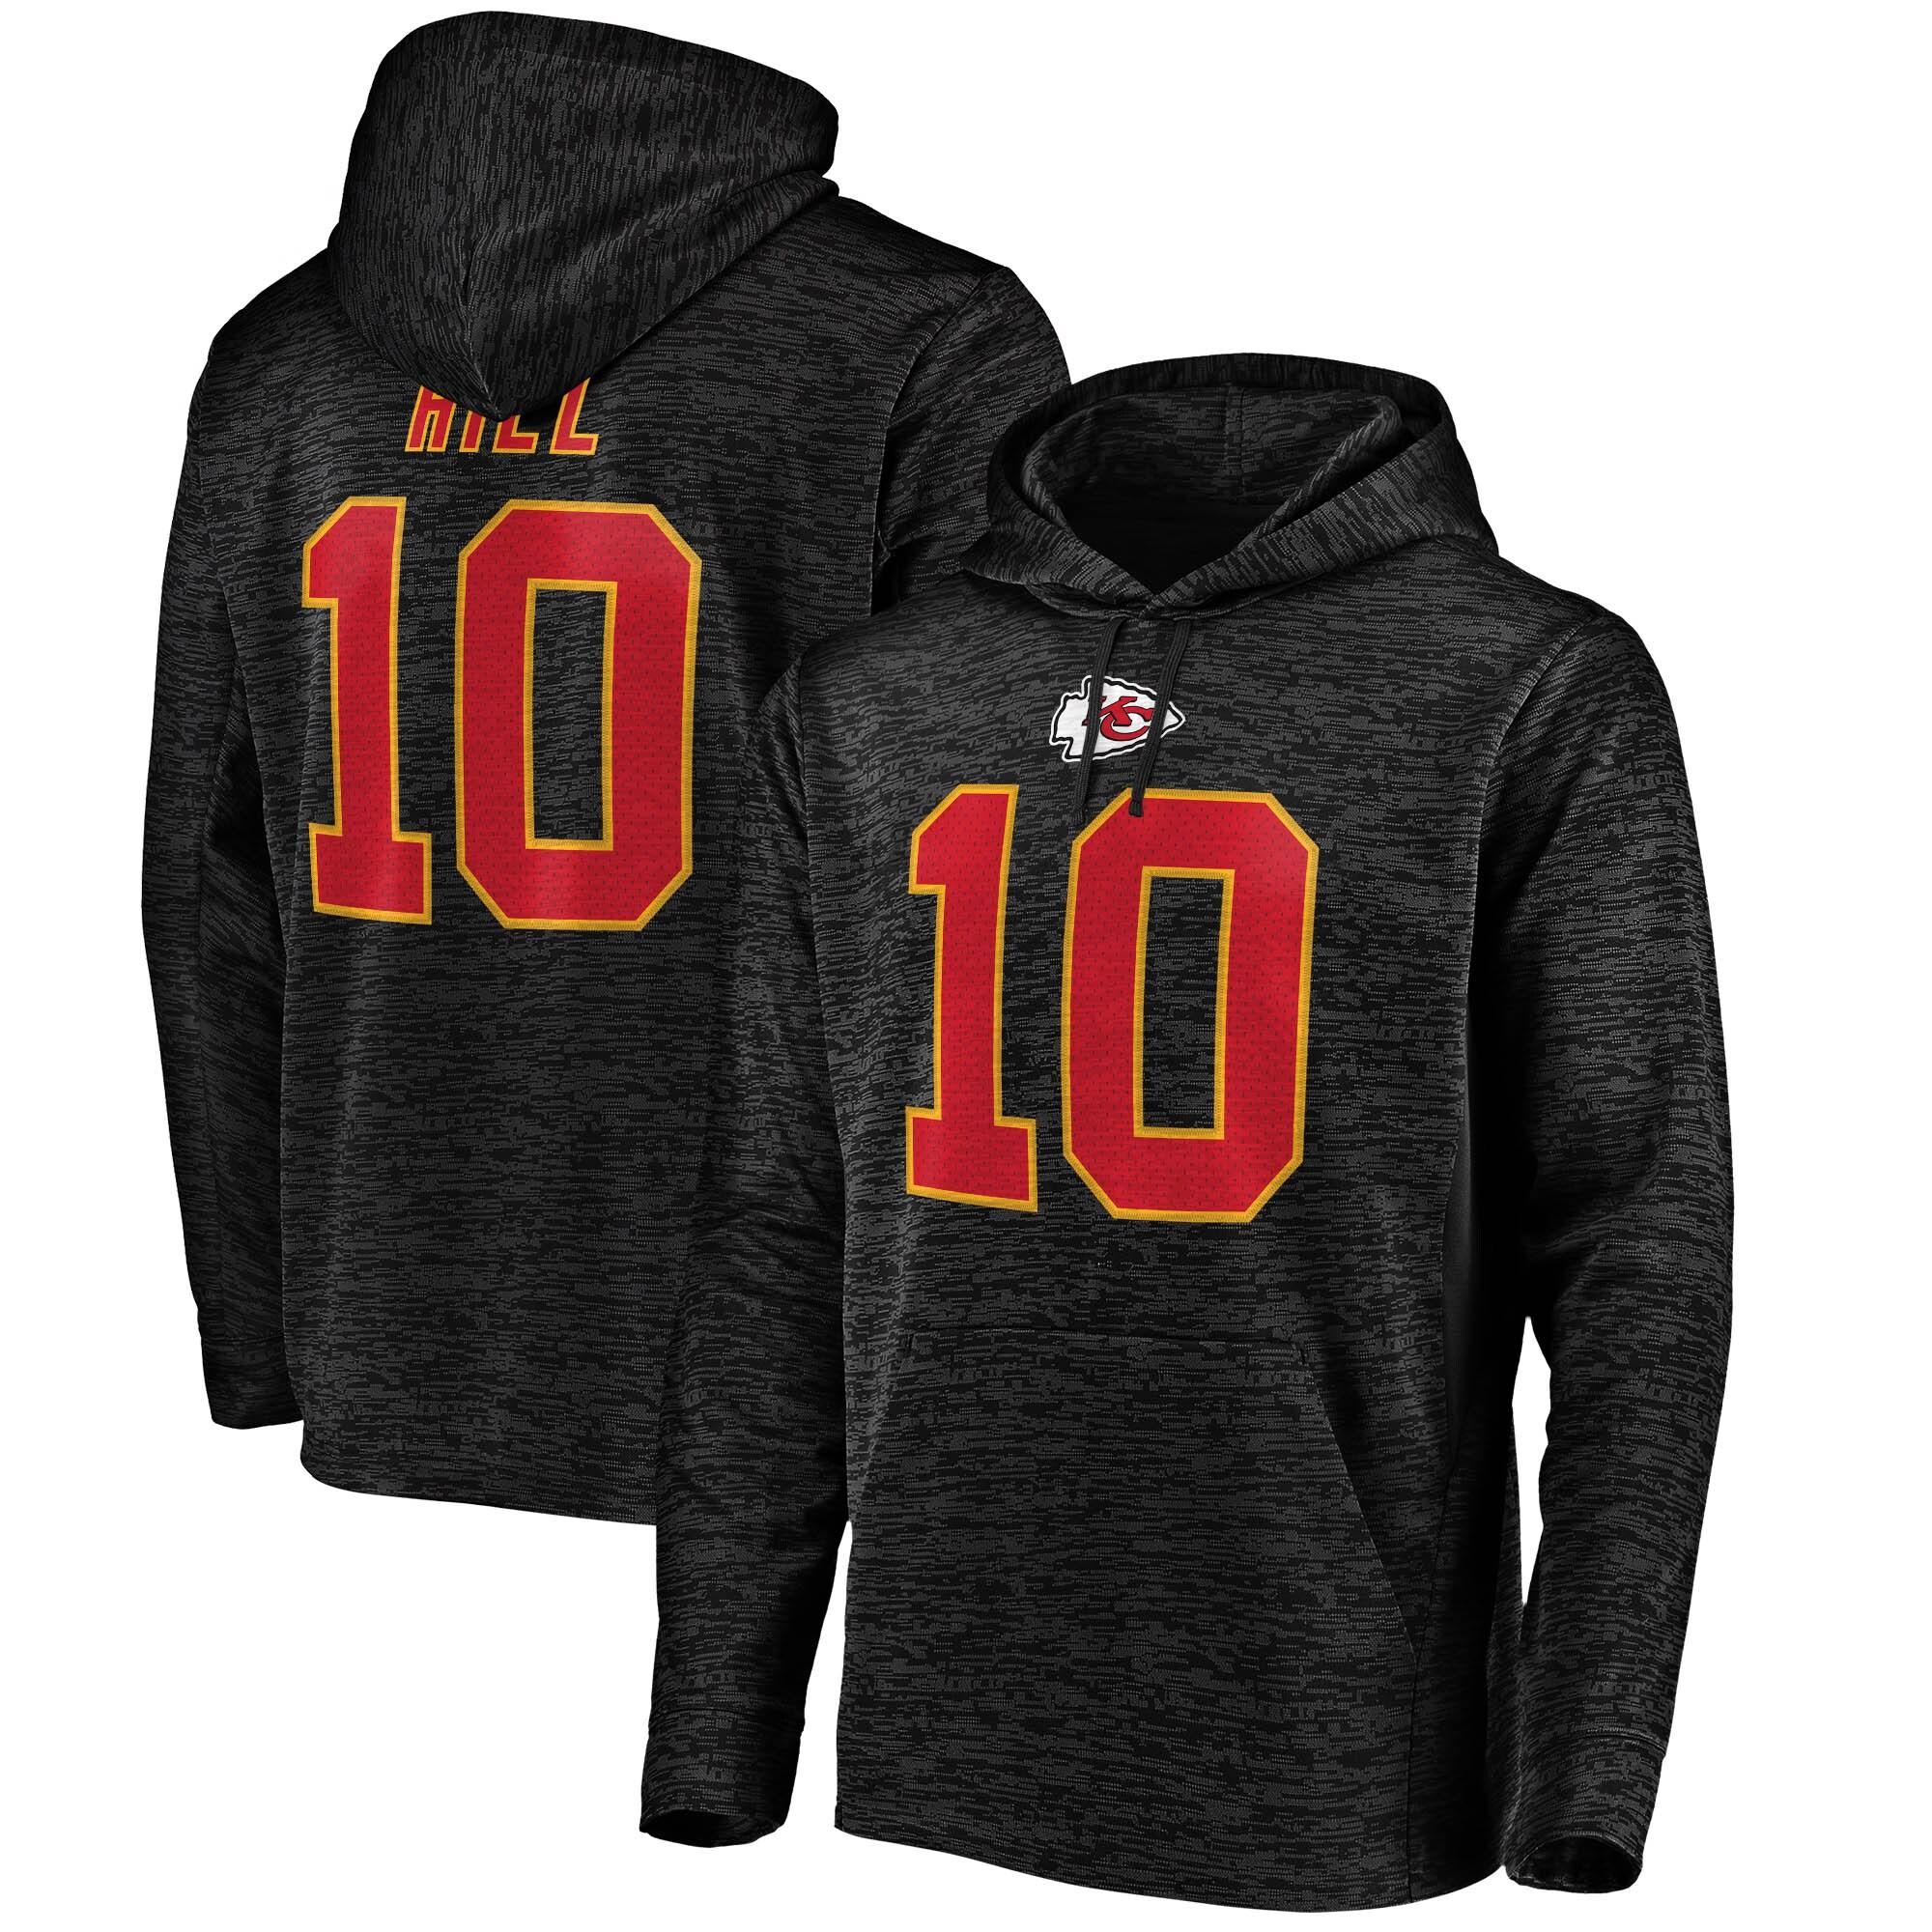 Tyreek Hill Kansas City Chiefs NFL Pro Line by Fanatics Branded Streak Fleece Name & Number Pullover Hoodie - Black